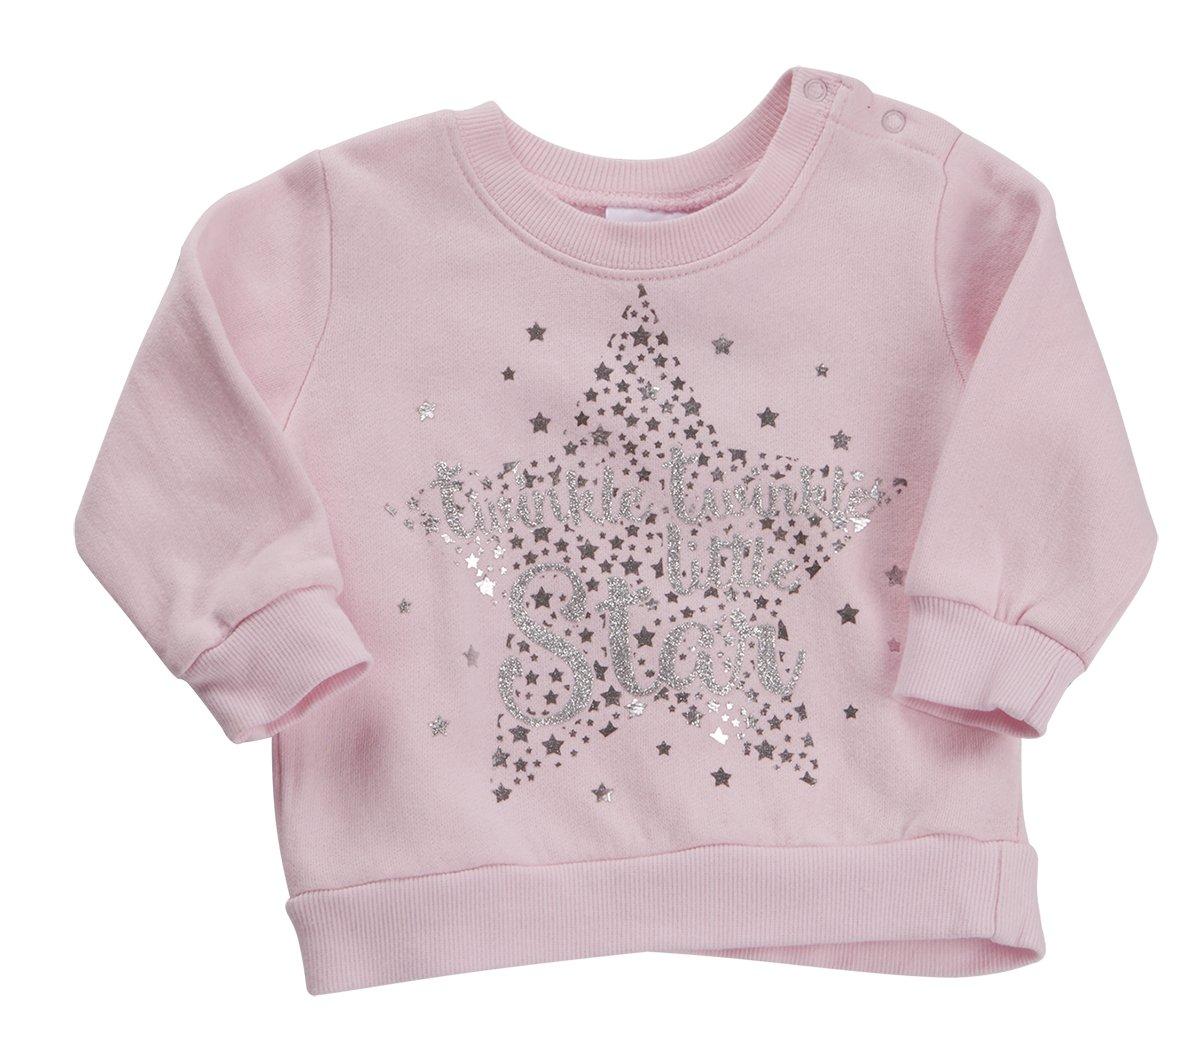 BABY TOWN BABYTOWN Babies Printed Design Novelty Jumper Sweatshirt